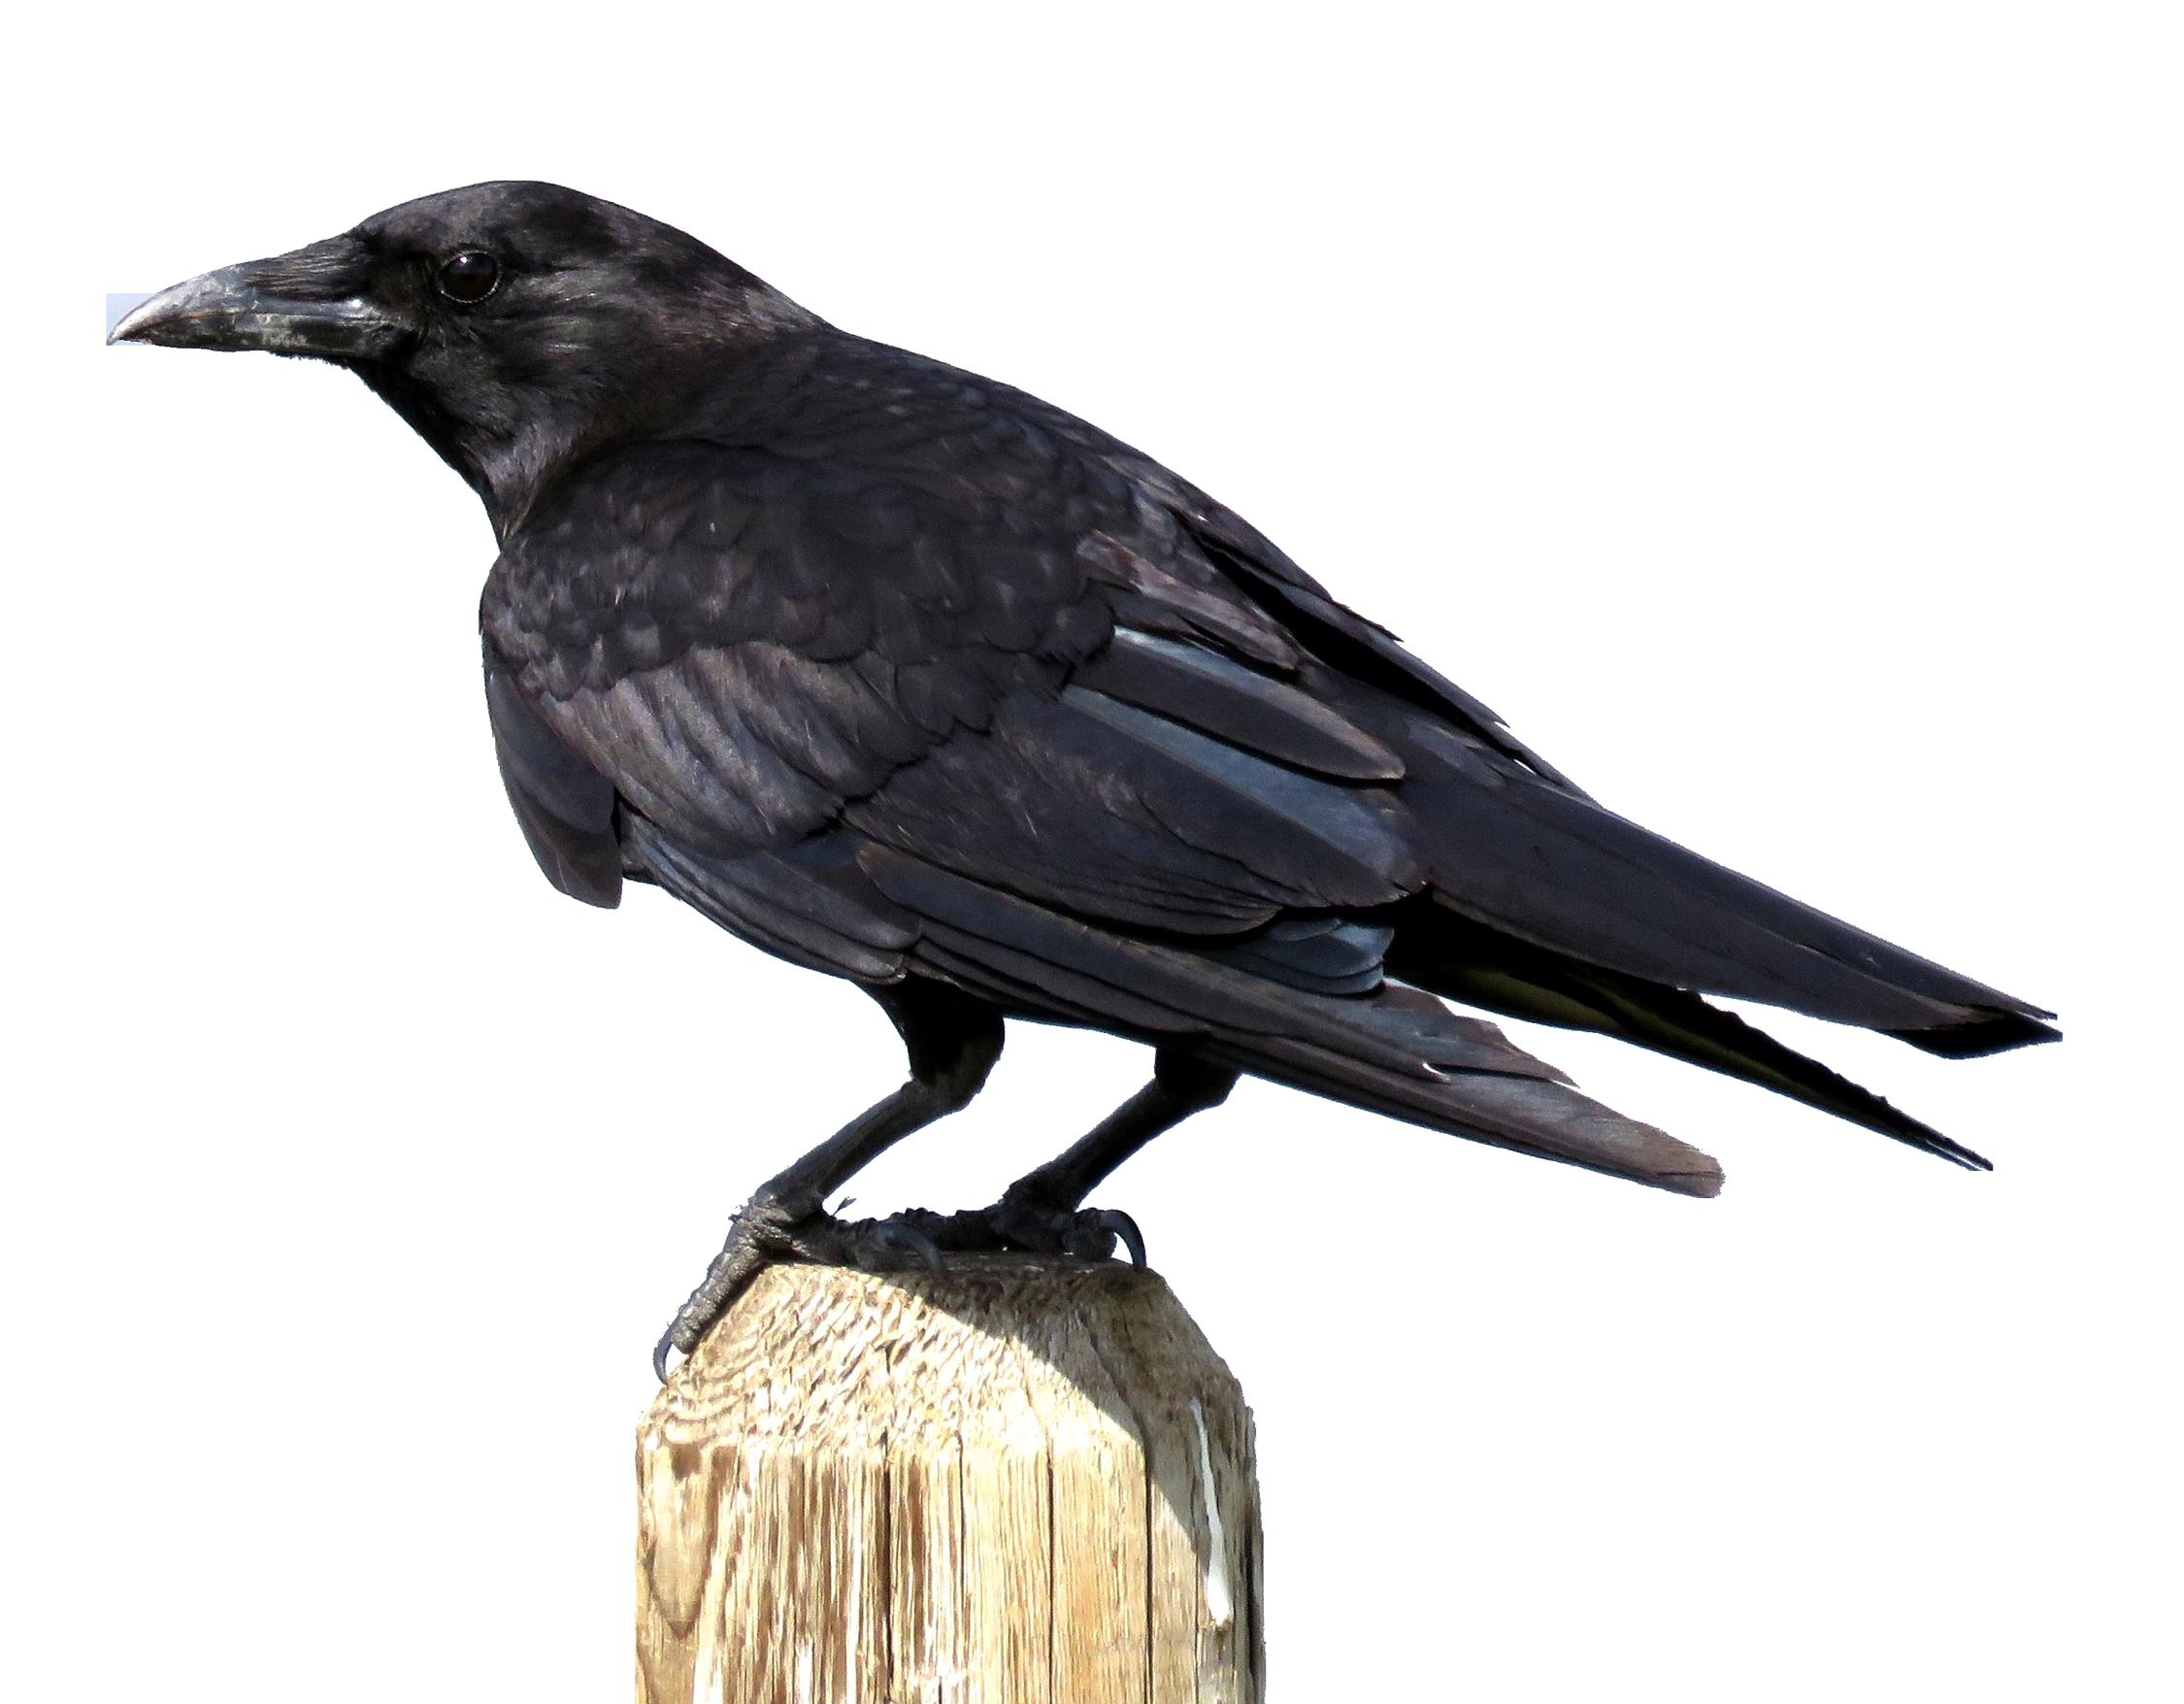 Transparent images png. Crow image pngpix